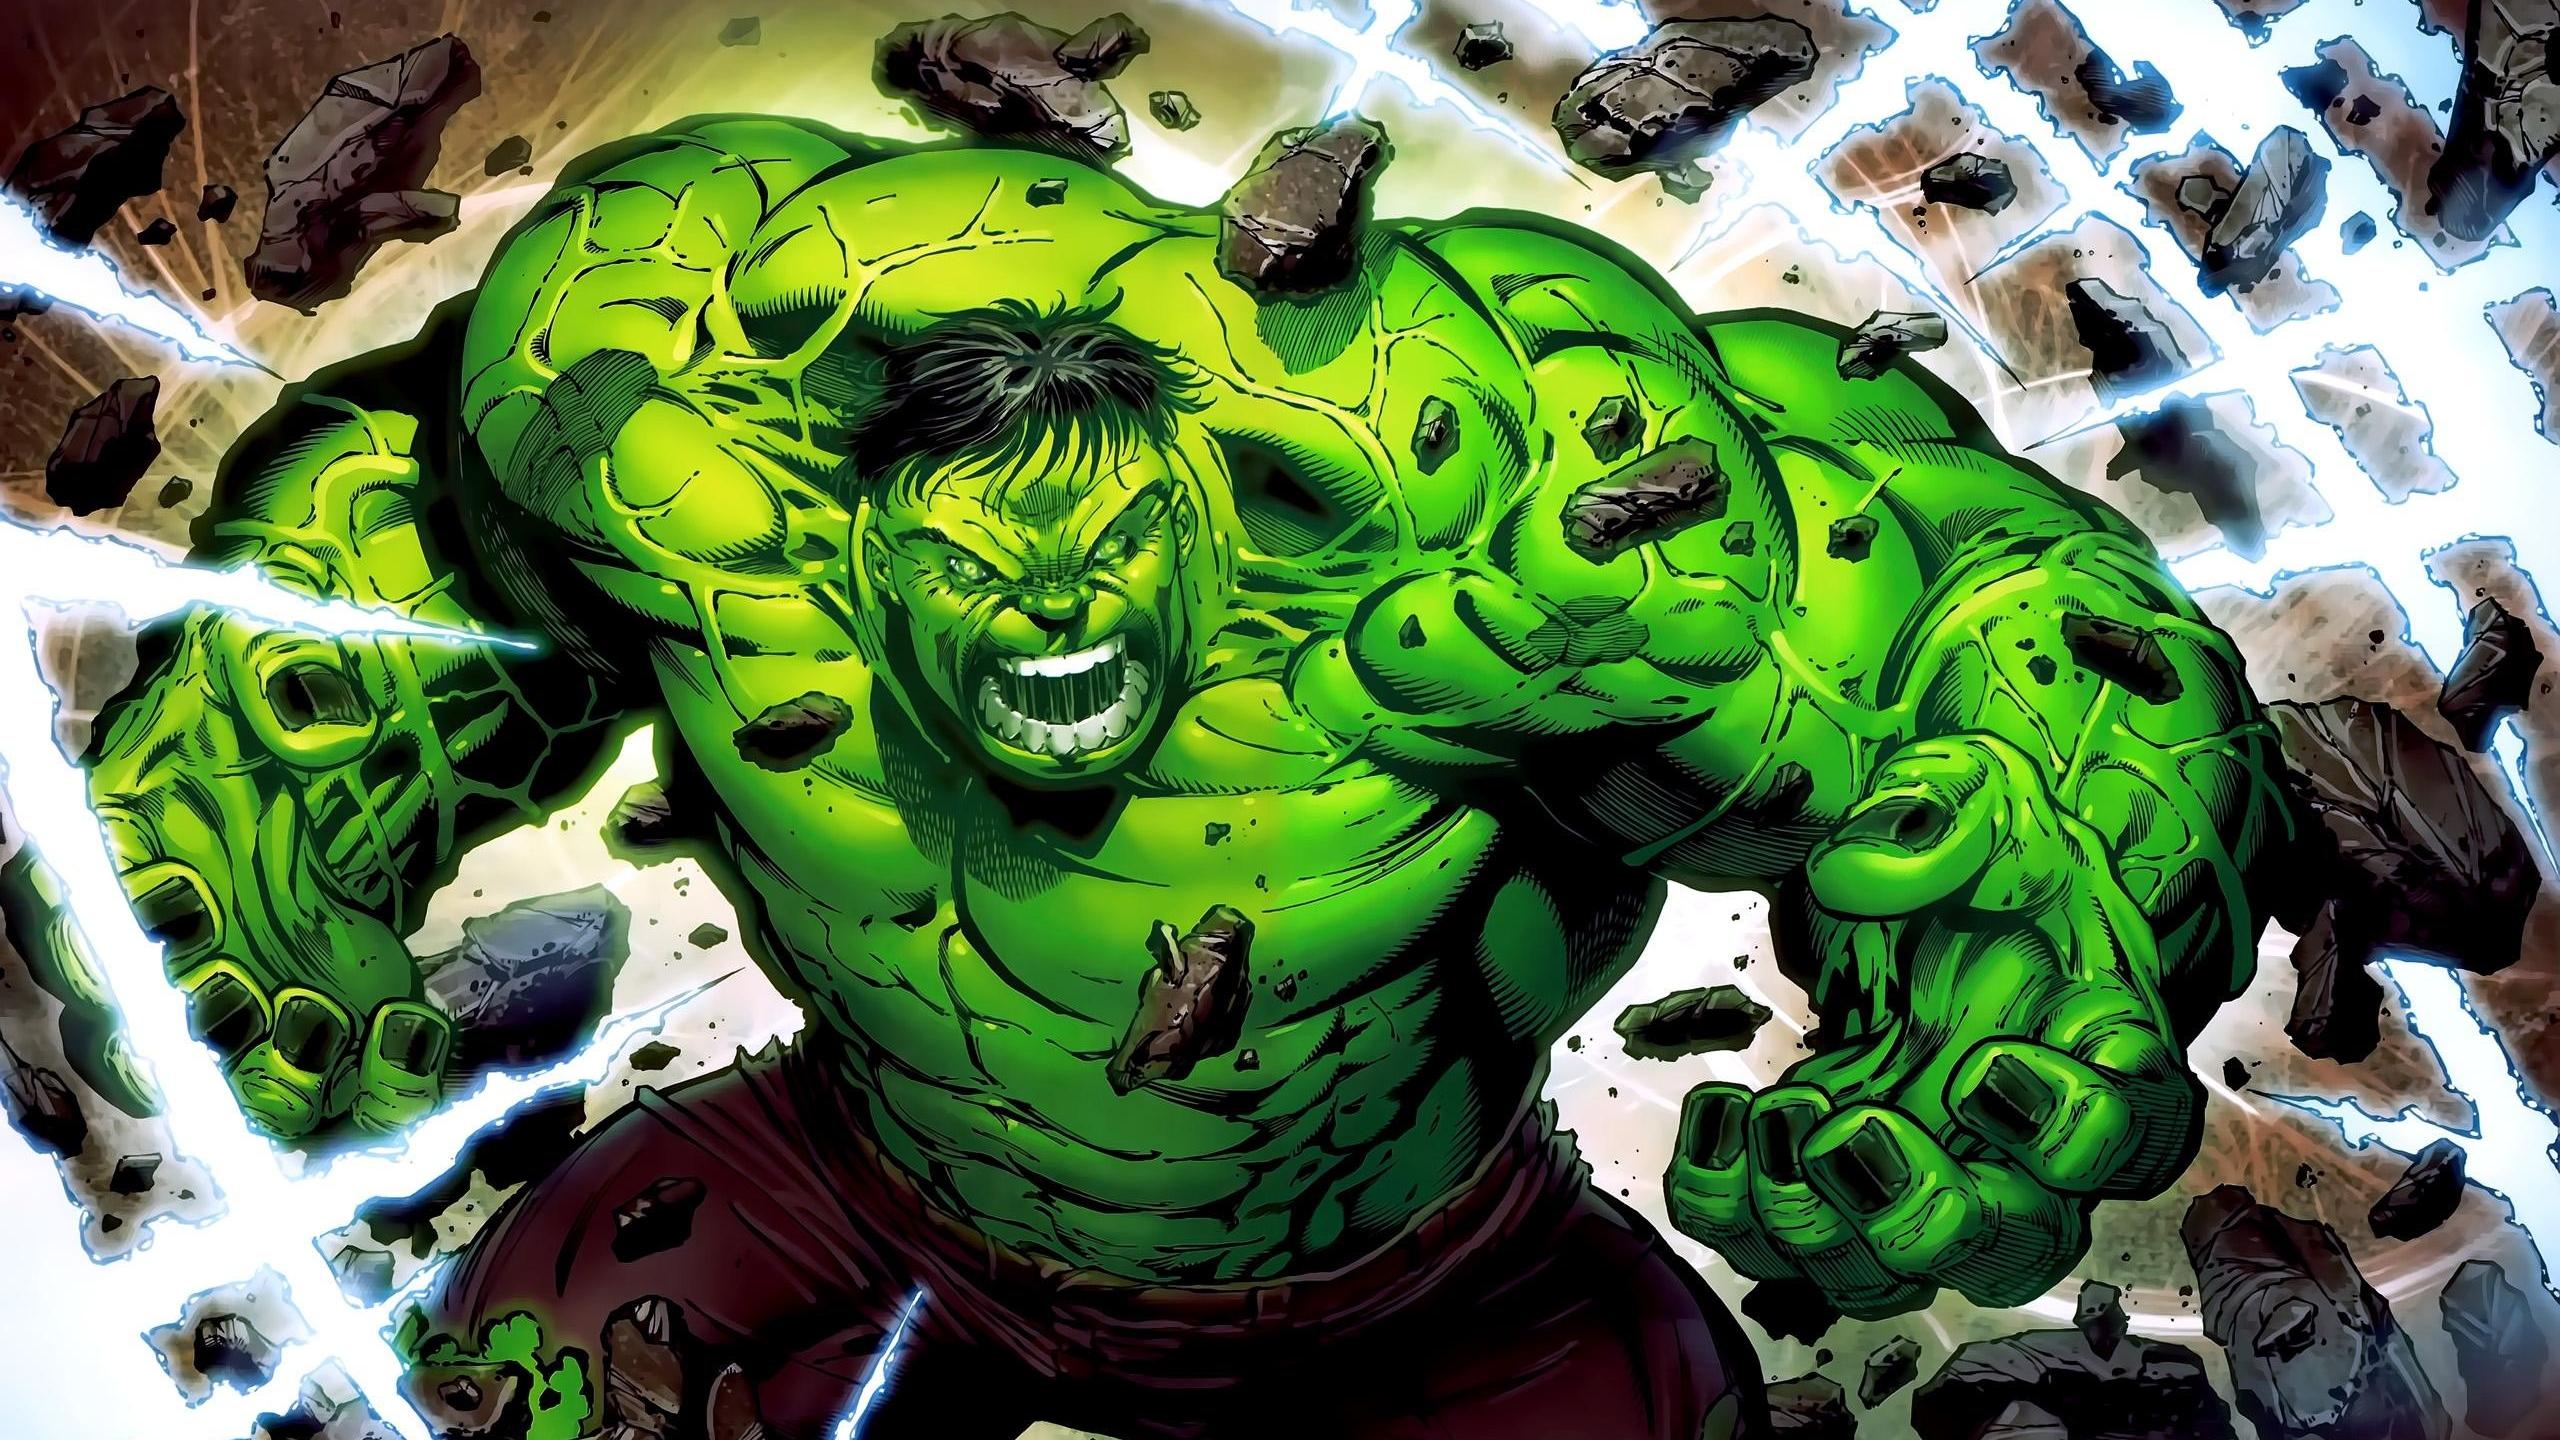 255 Hulk HD Wallpapers | Backgrounds - Wallpaper Abyss